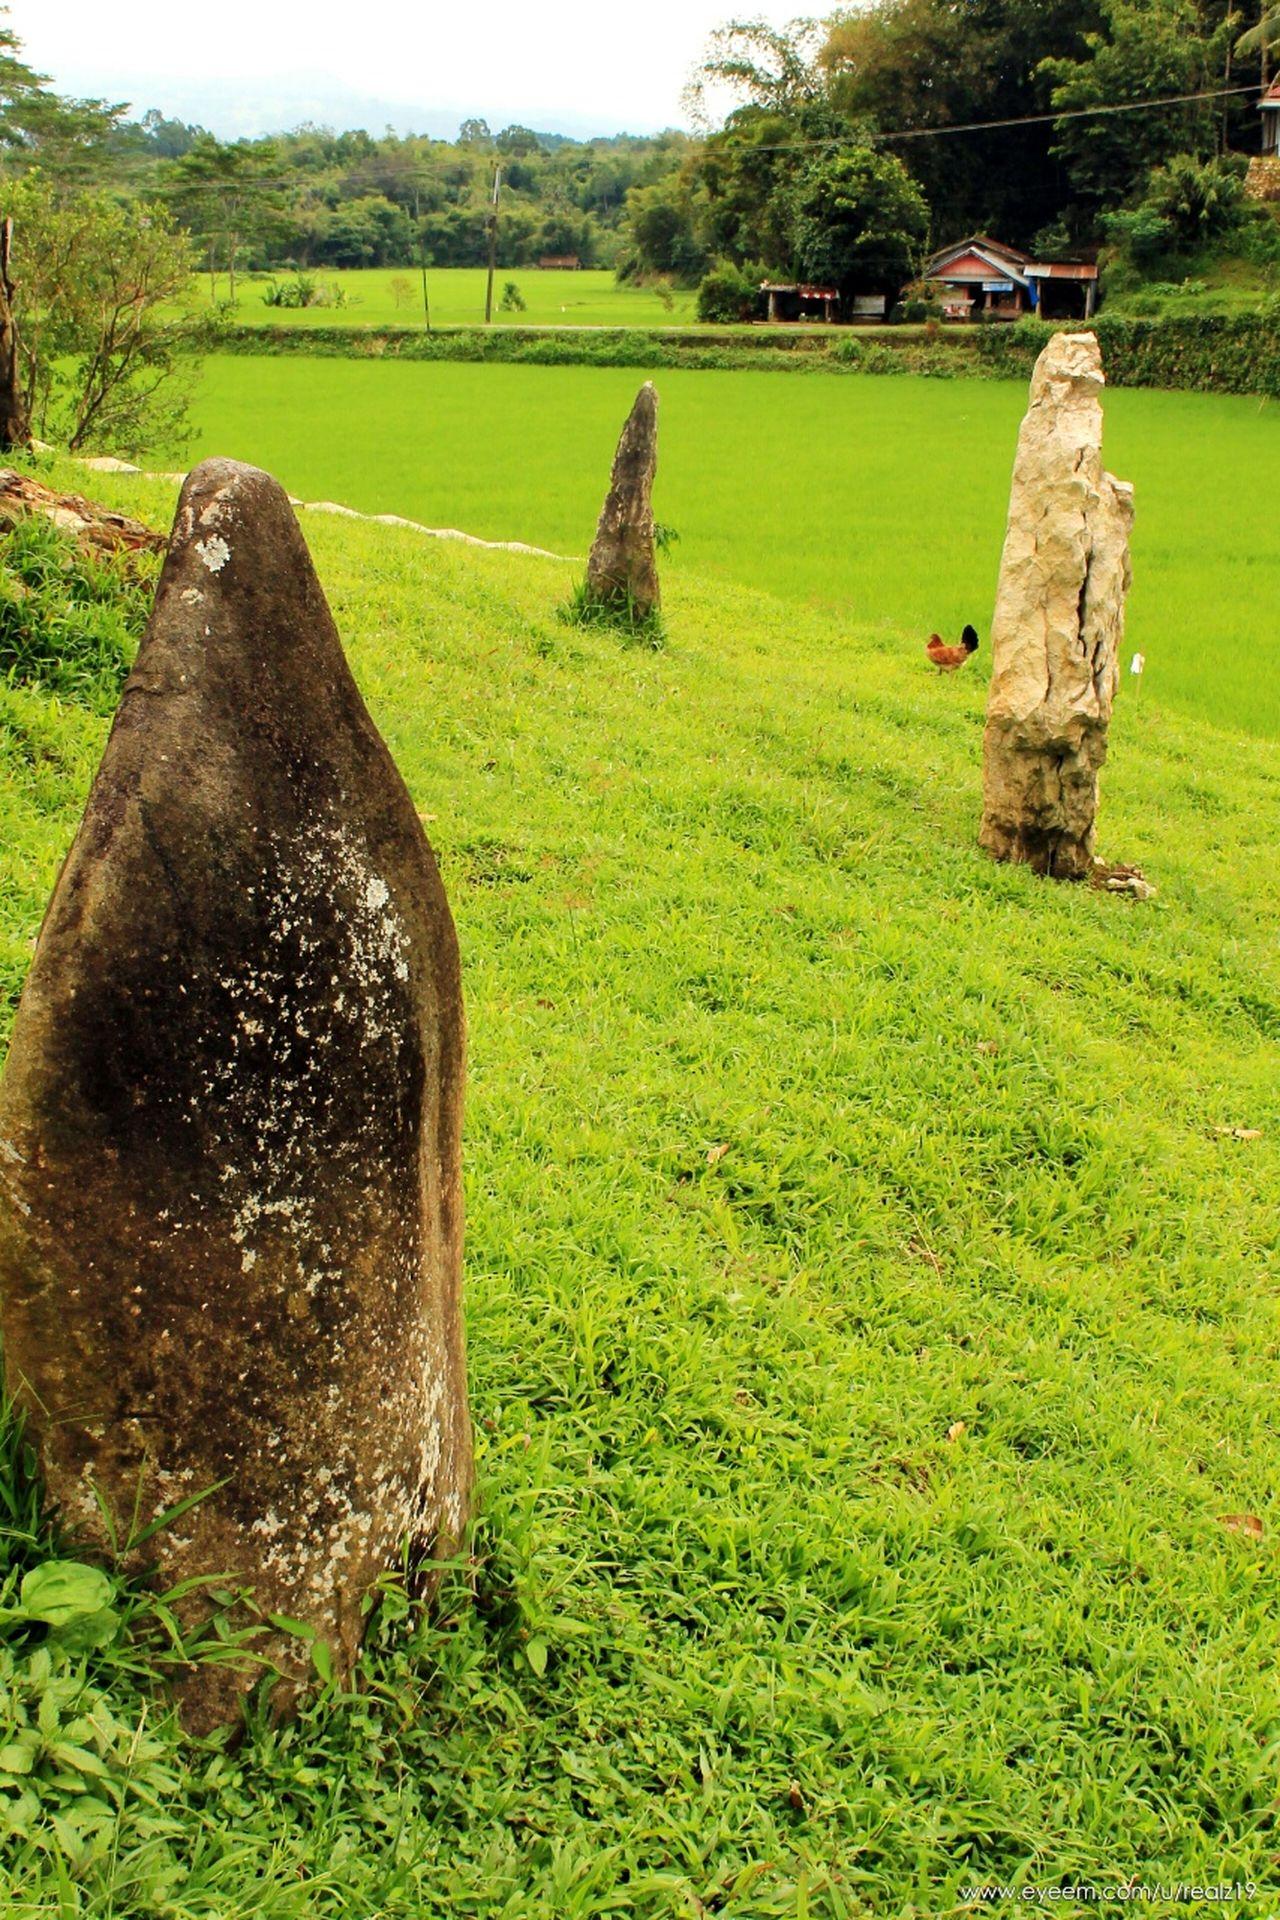 Menhir Menhirs Green Green Grass Green Hill Toraja Kete Kesu Rantepao Toraja Utara Travel Destinations Tree INDONESIA Nature Outdoors